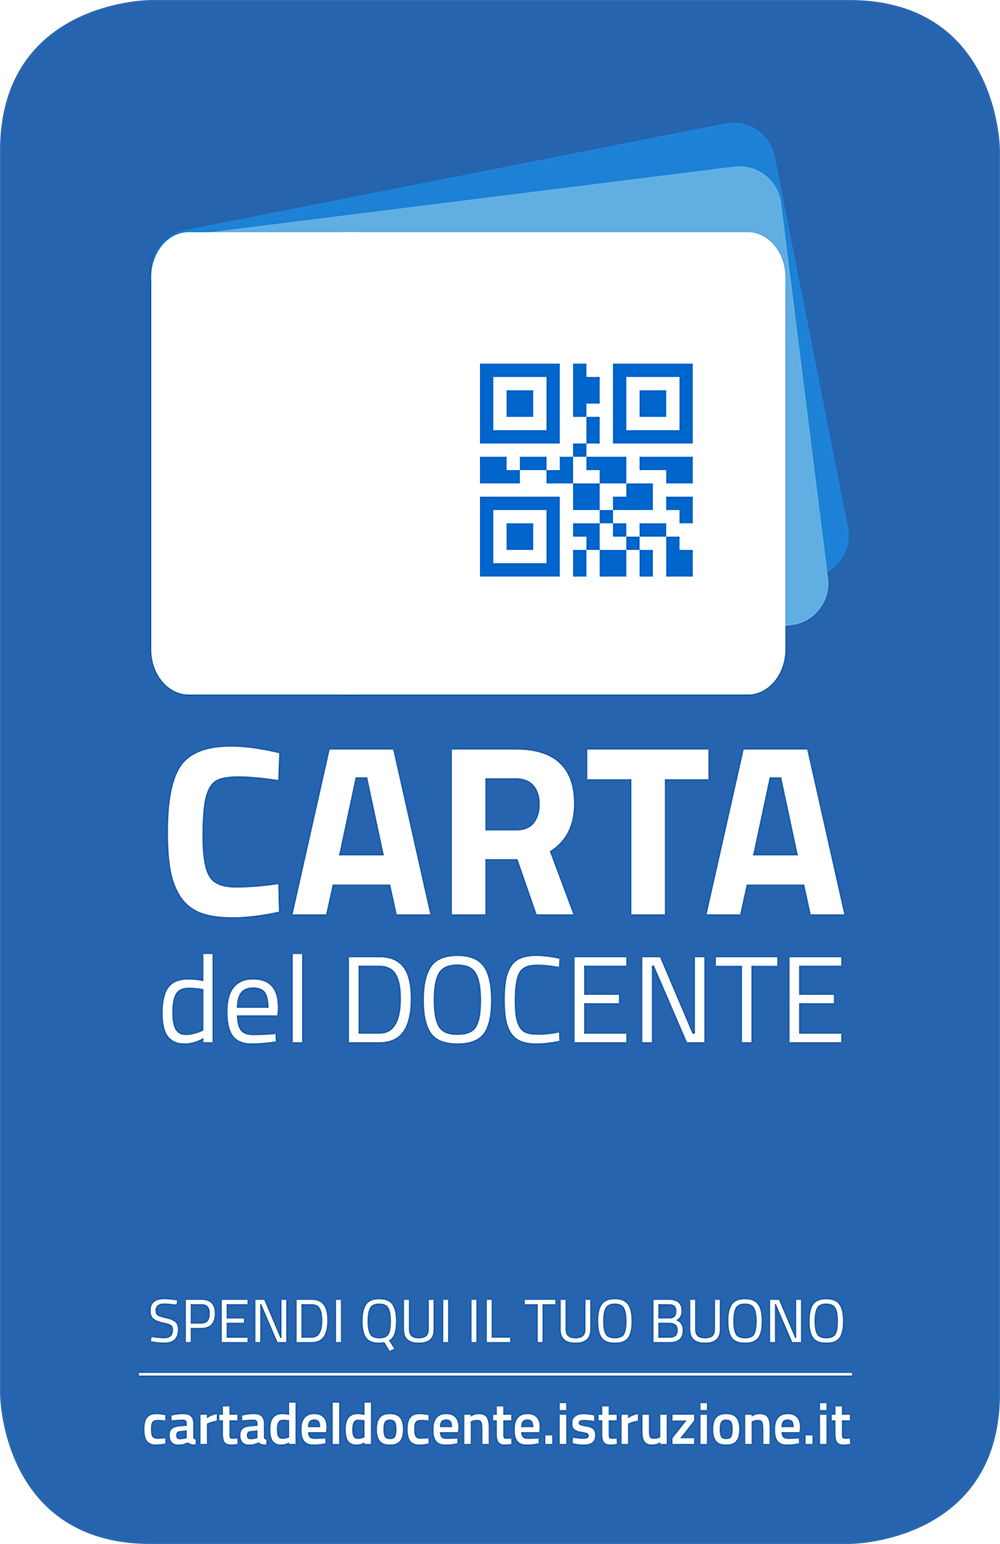 _CardaDocente